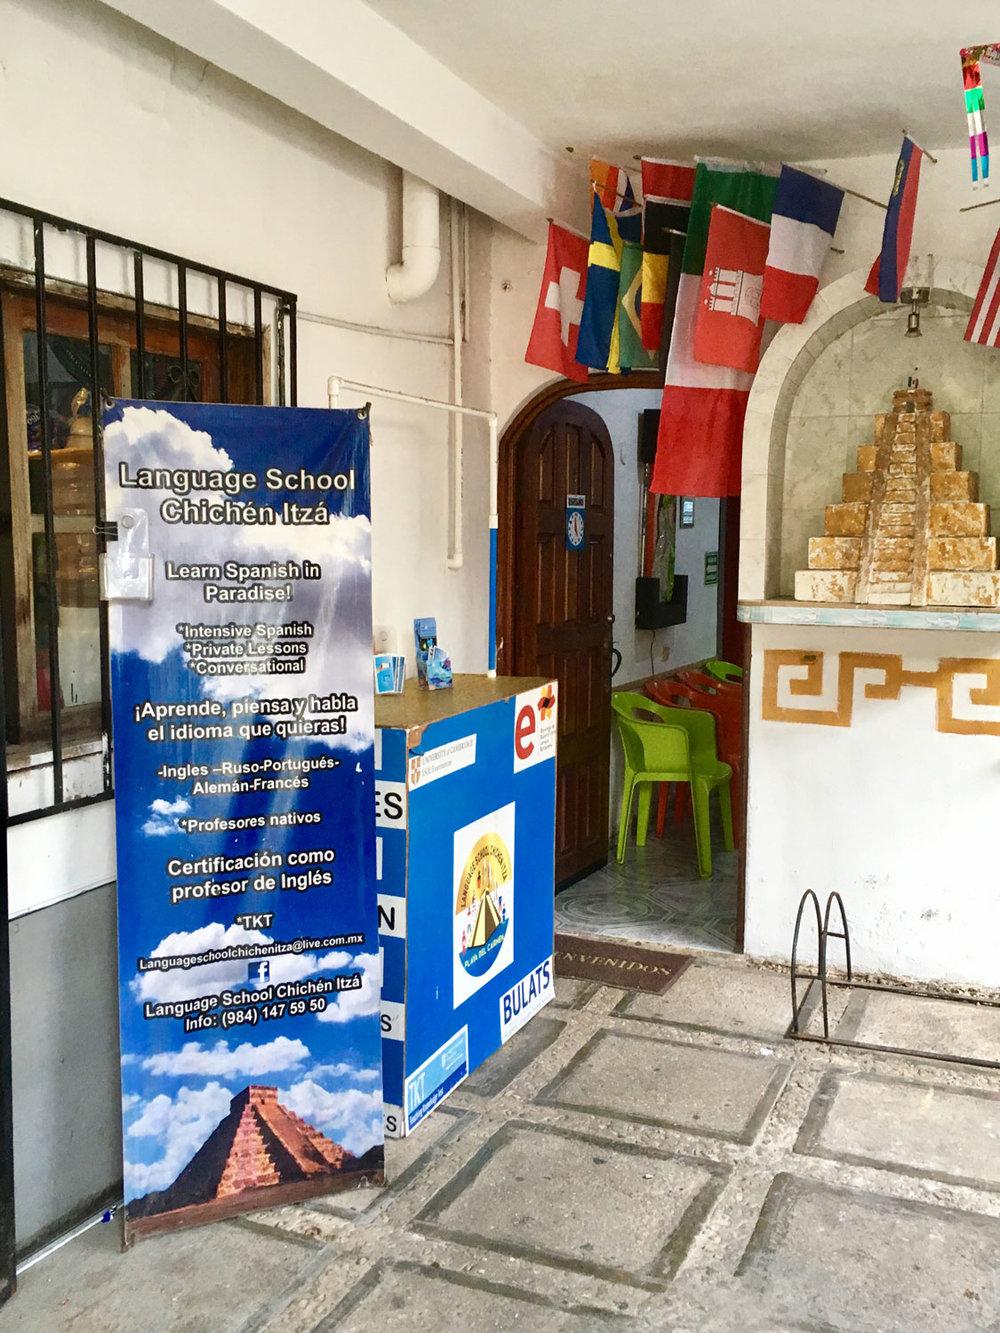 Chichén Itzá  language school